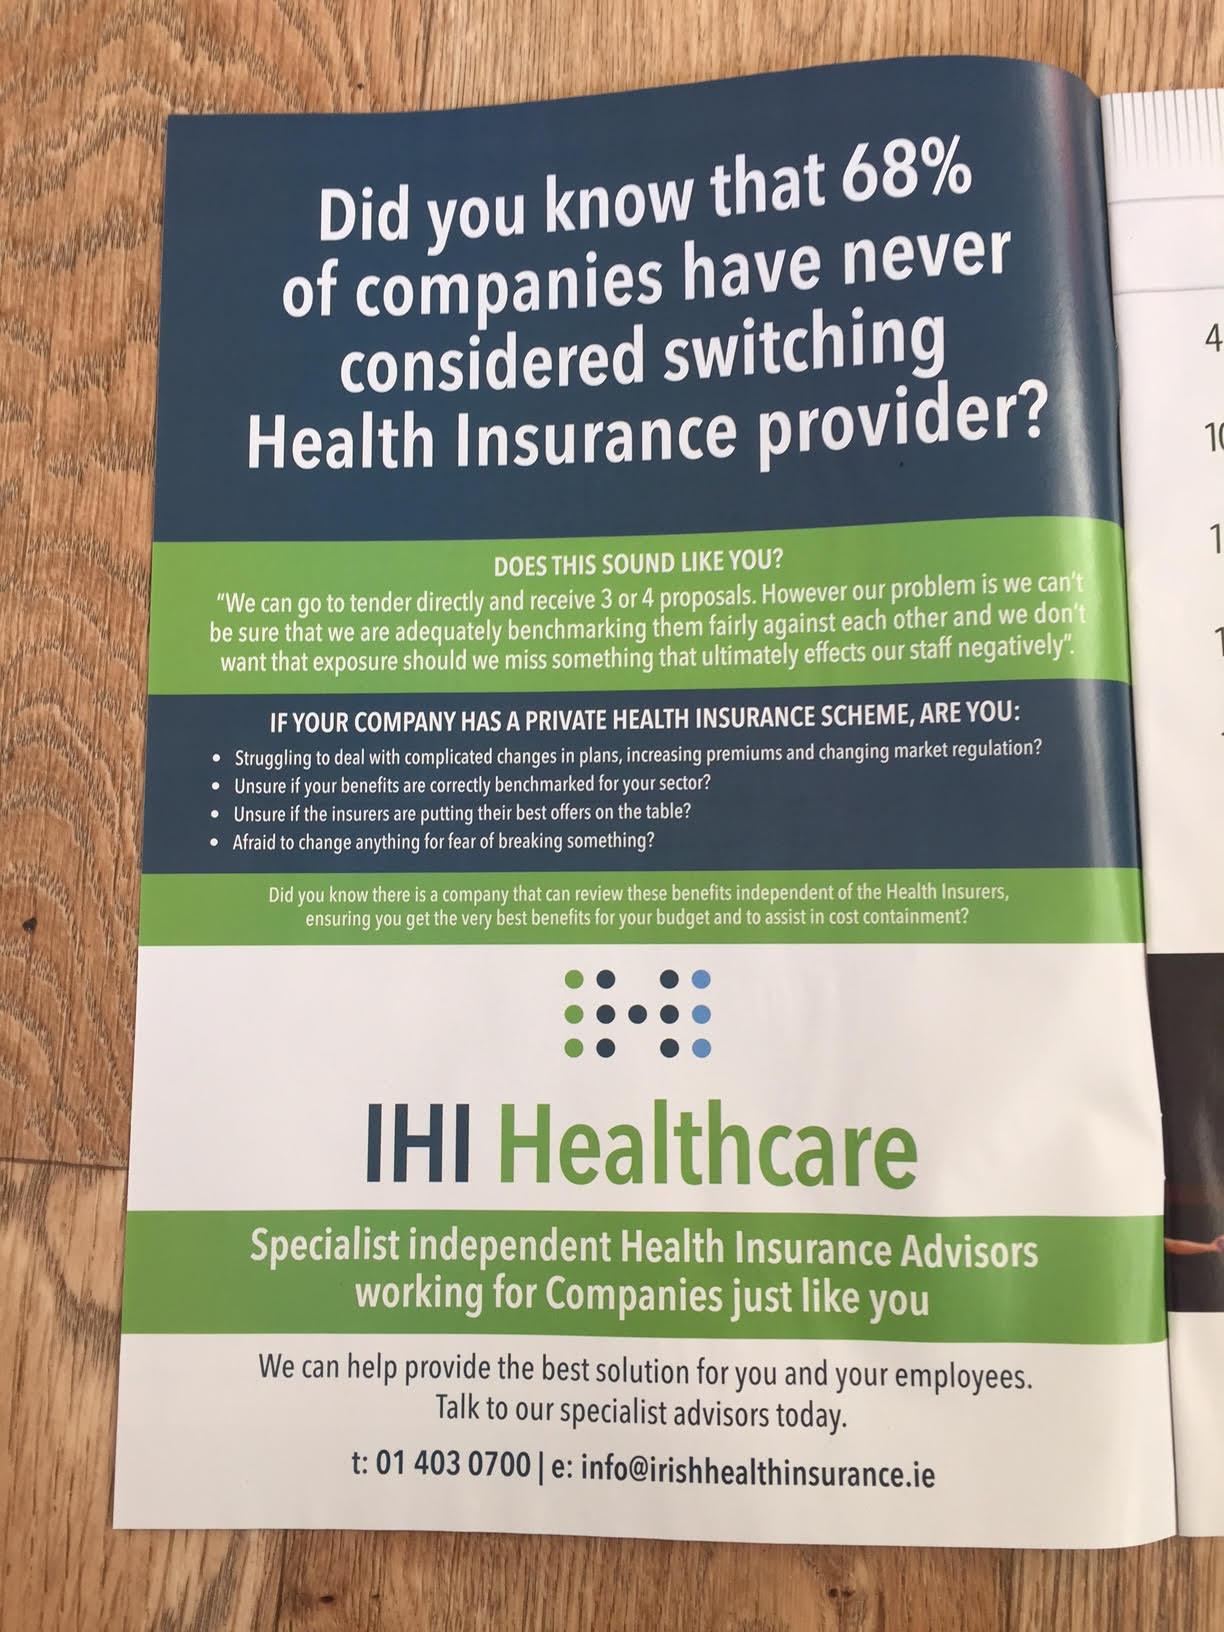 IHI Healthcare